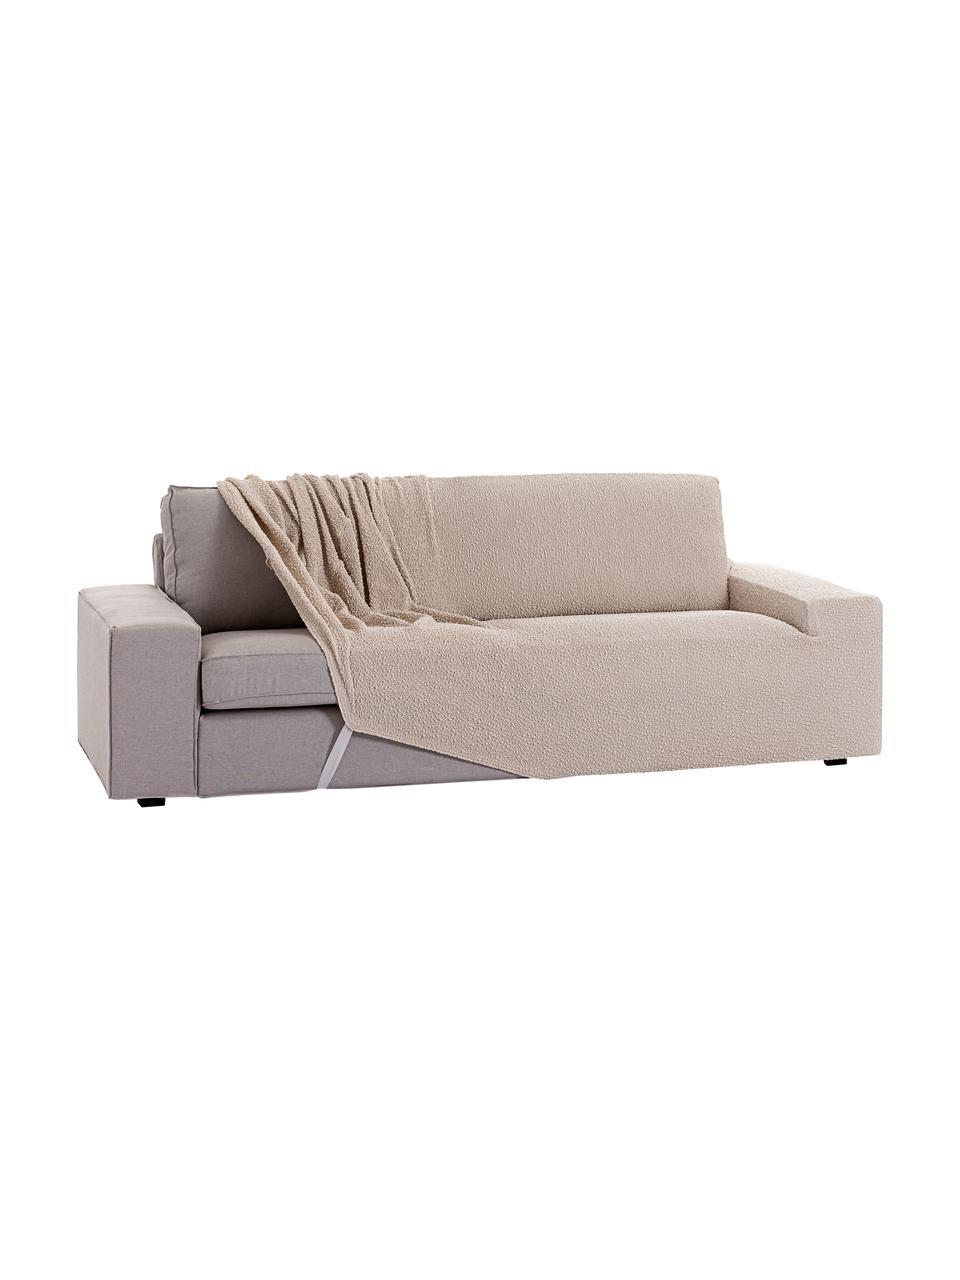 Copertura divano Roc, 55% poliestere, 35% cotone, 10% elastomero, Beige, Larg. 260 x Alt. 120 cm